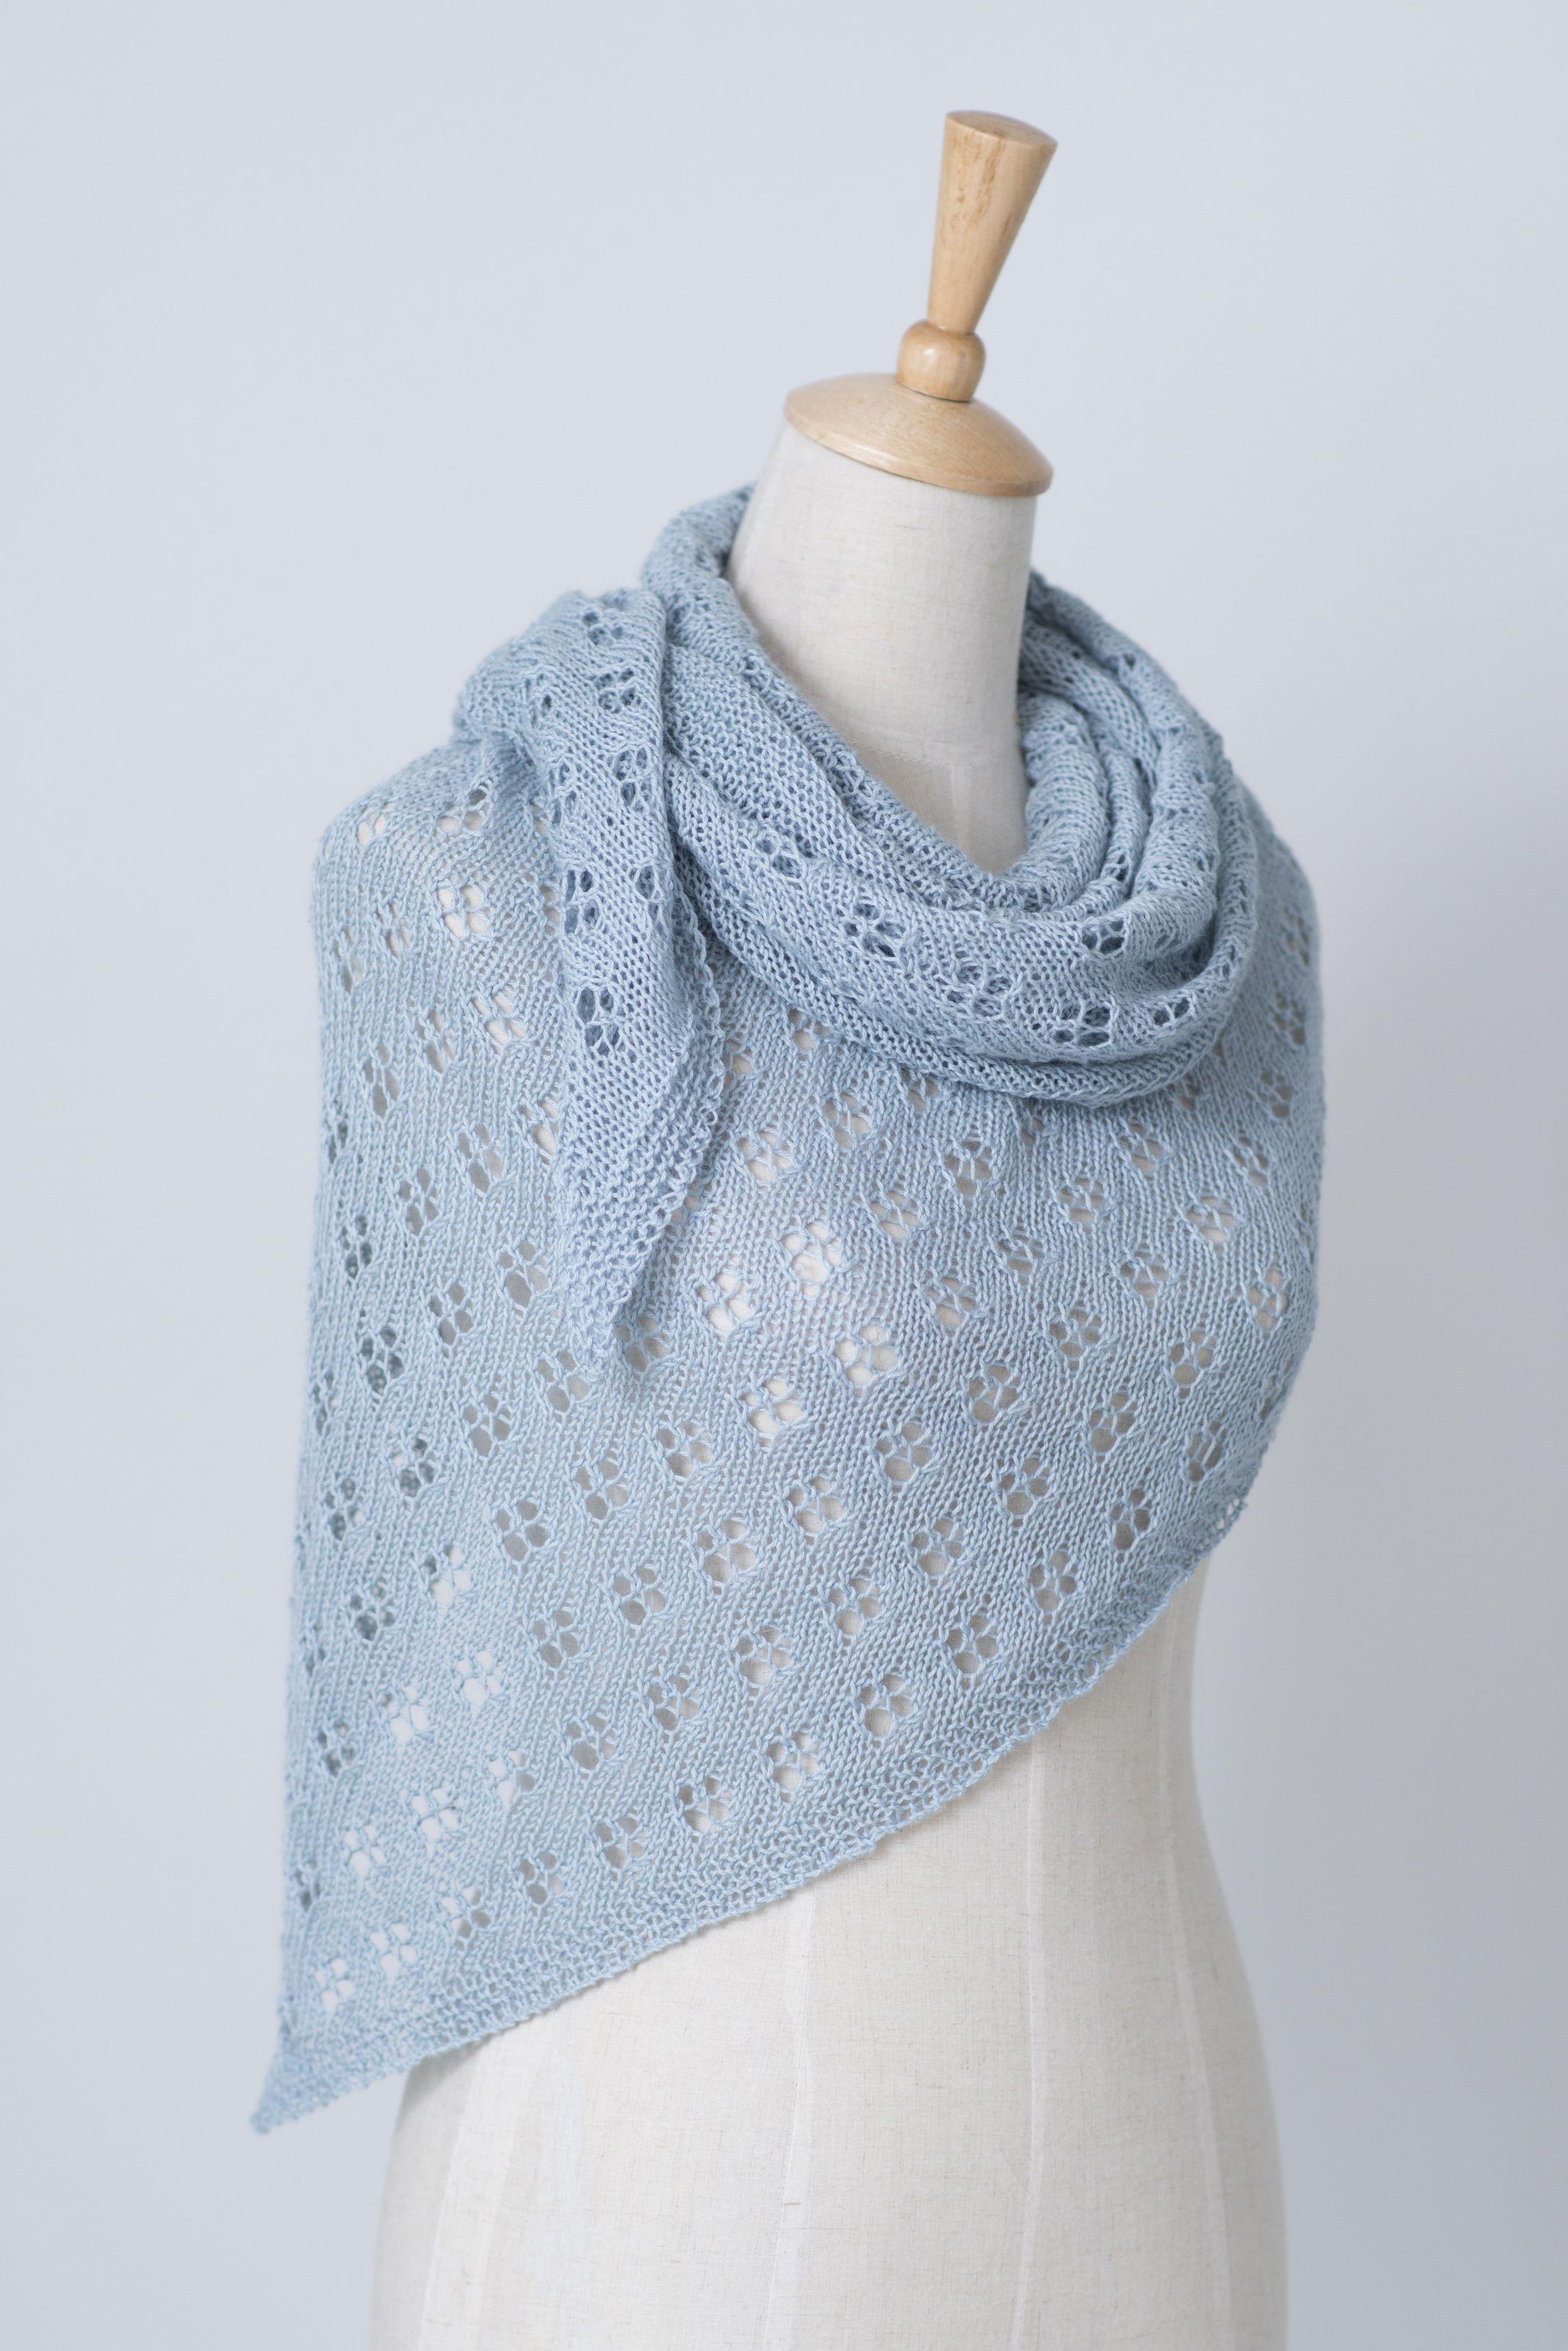 Quatrefoil Pattern By Janina Kallio Knit Shop Knitting